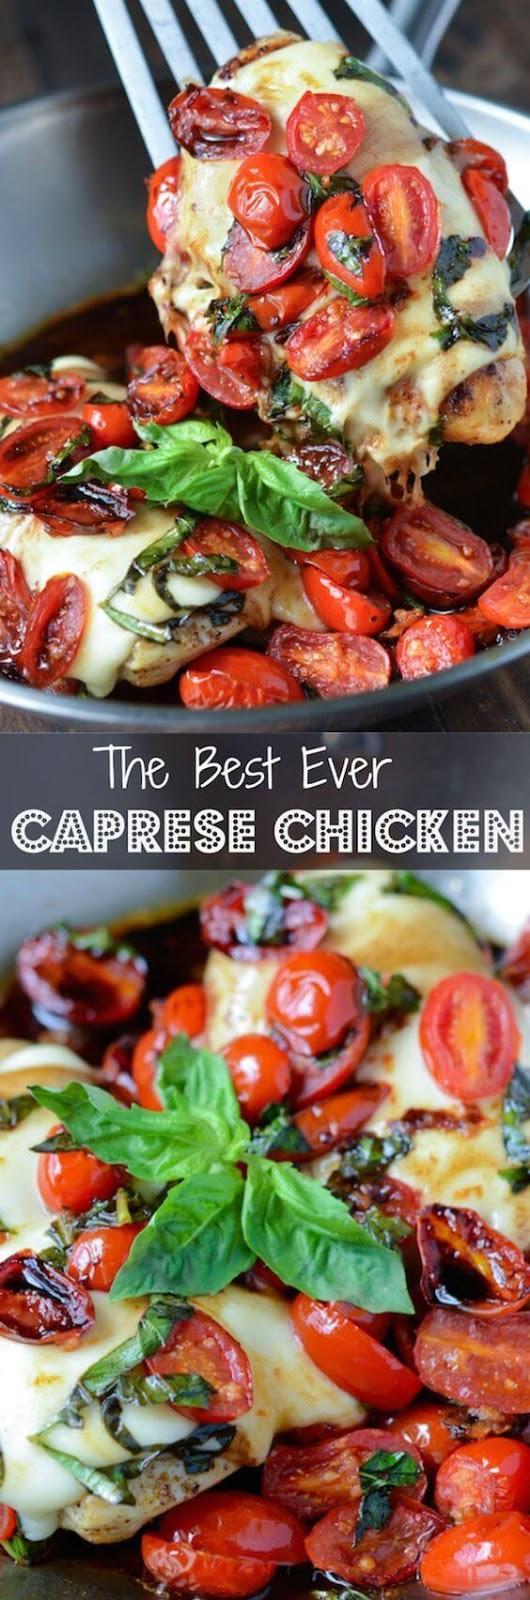 The Best Ever Caprese Chicken